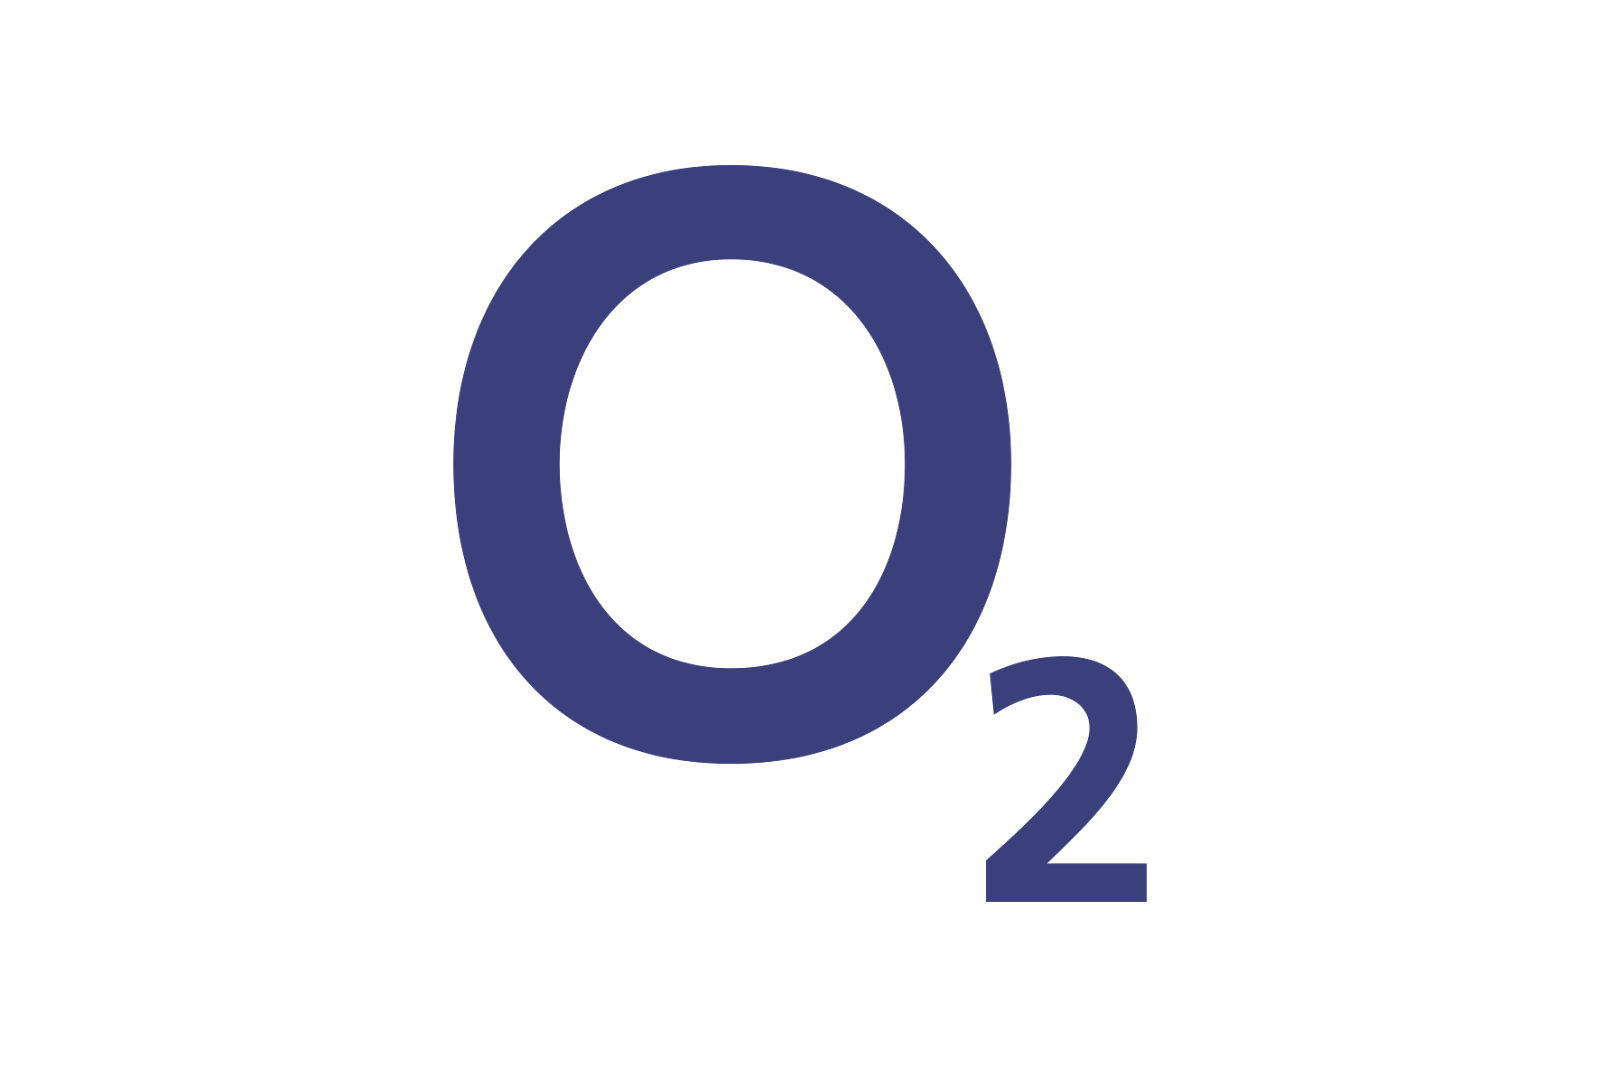 02-mobiletempel24-roedermark